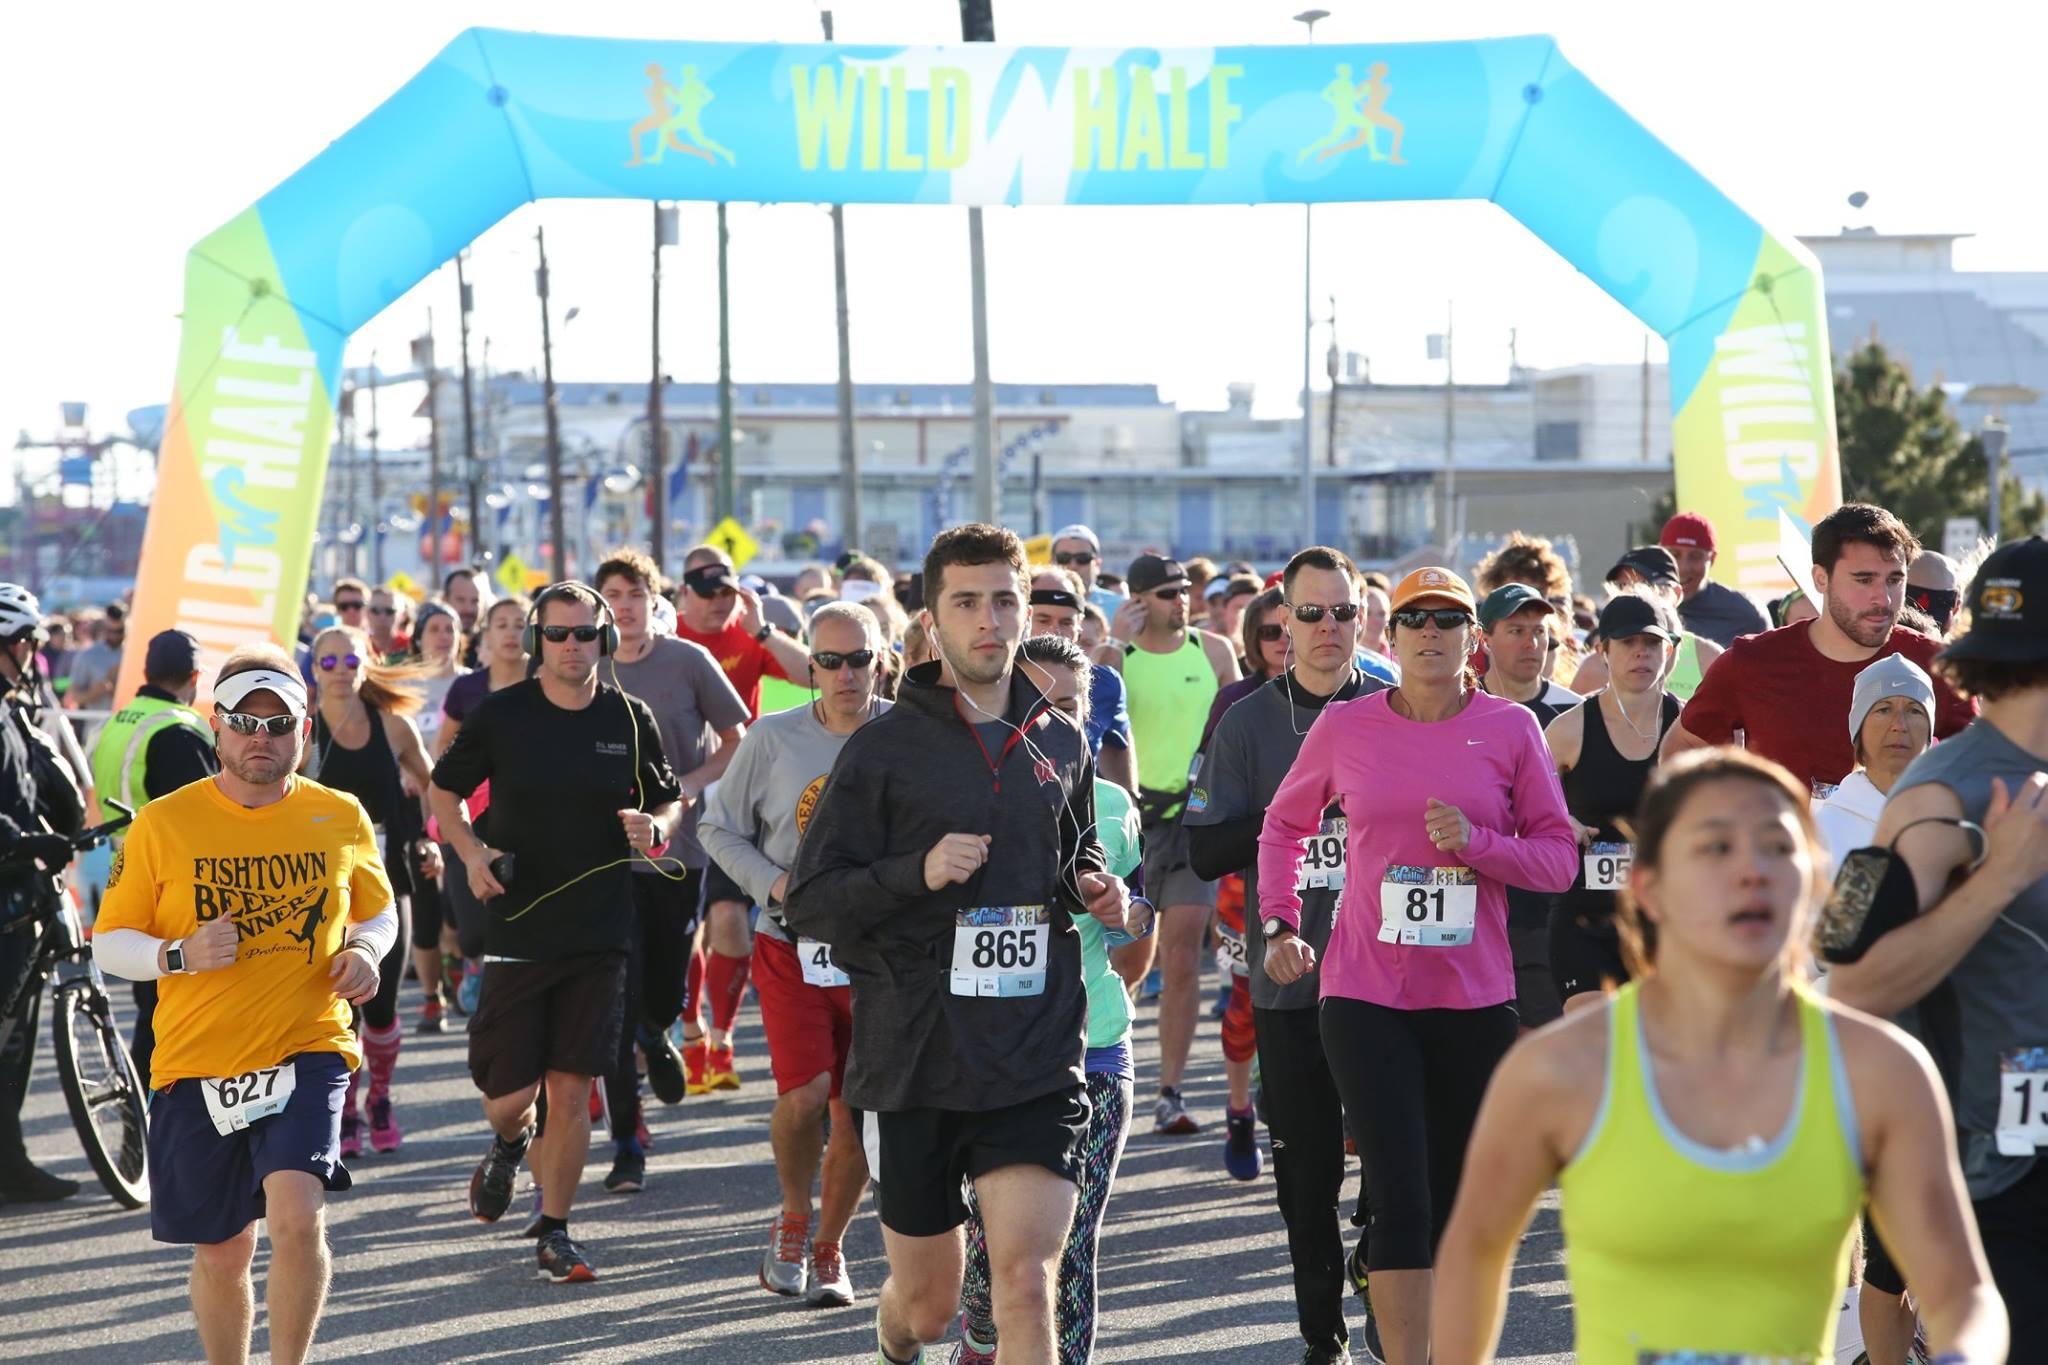 TWH - start run